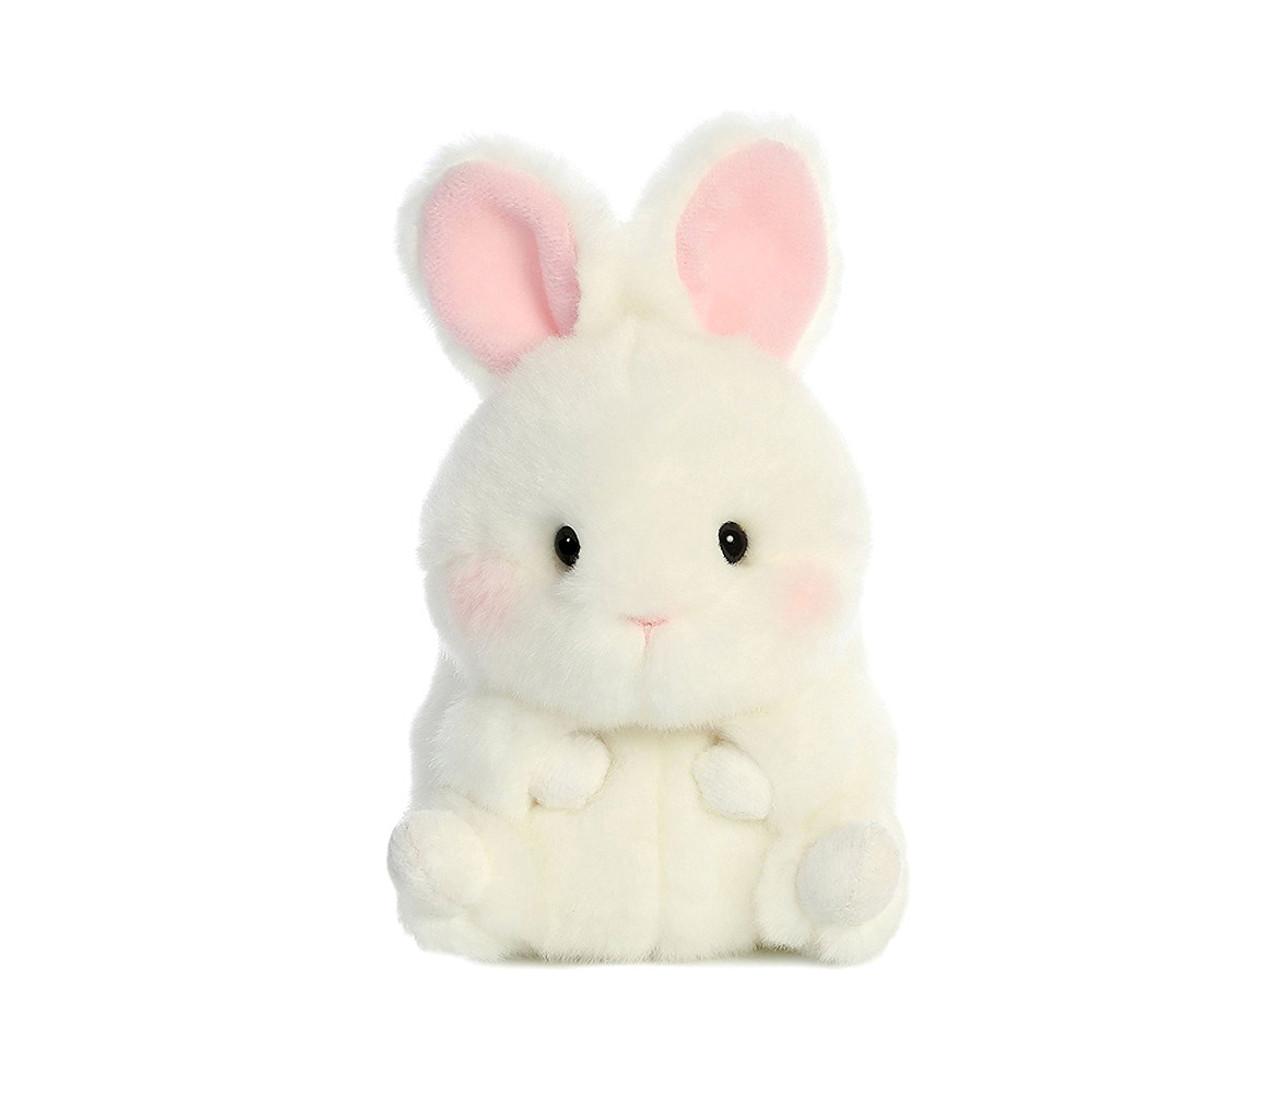 35d81e465828 ... Stuffed Animals Aurora Bunbun Bunny Rolly Pet Super Soft Plush · 175010